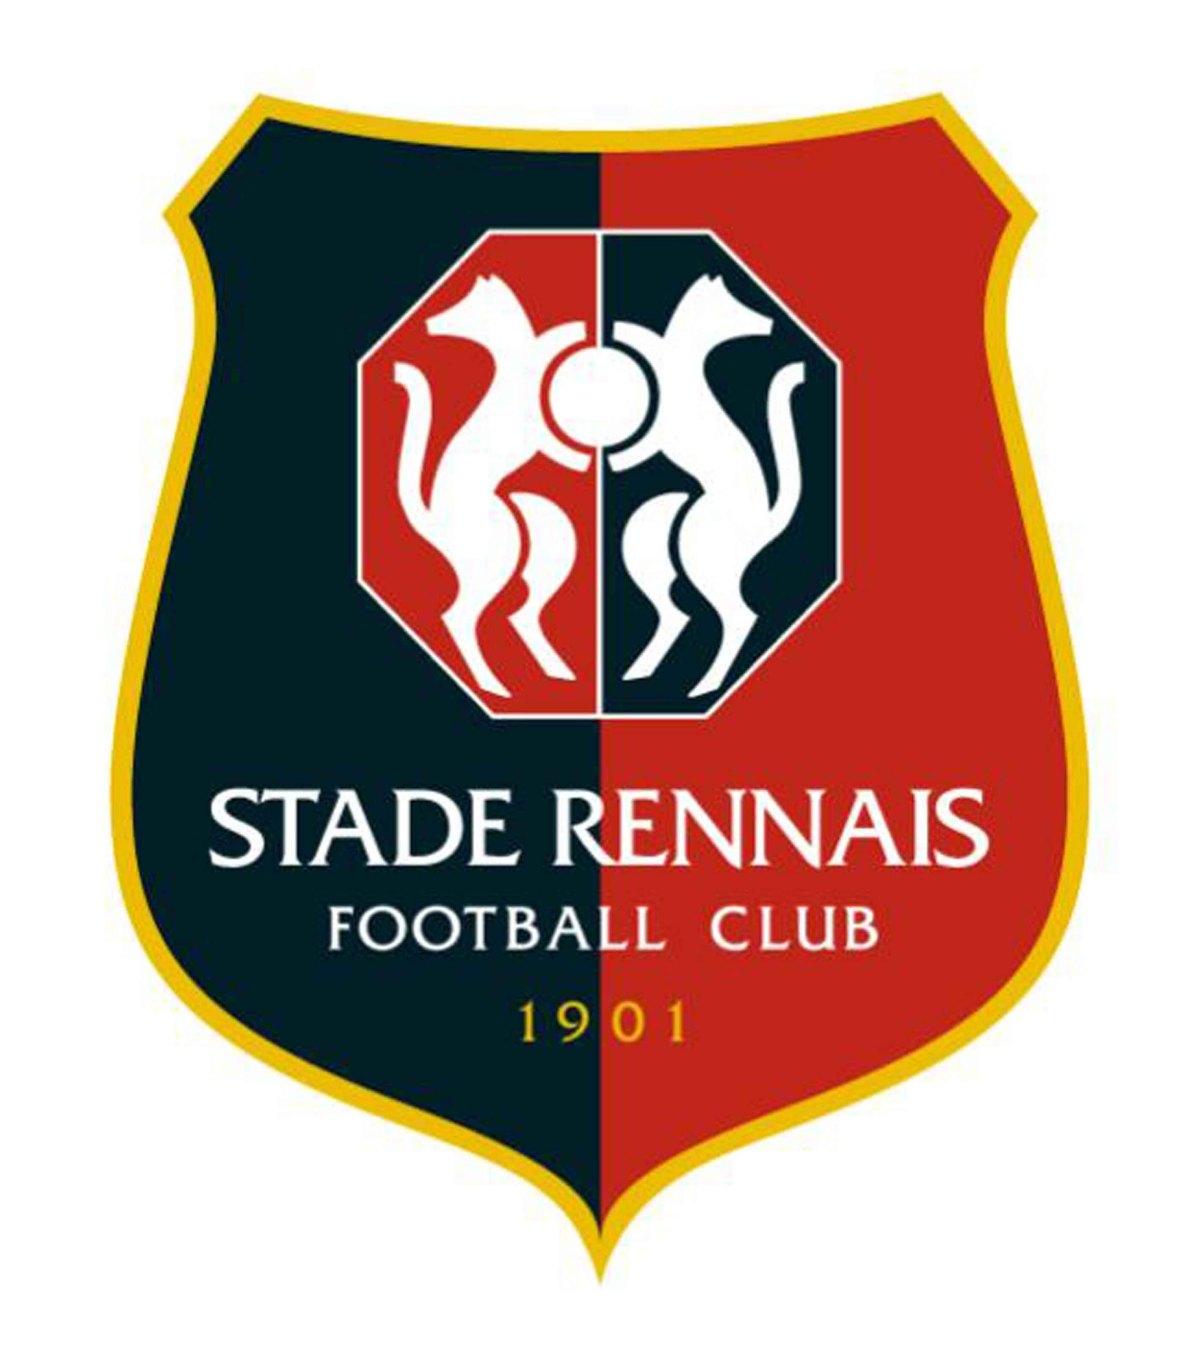 Les clubs de football fran ais se racontent en logo blog shane - Logo club foot bresil ...